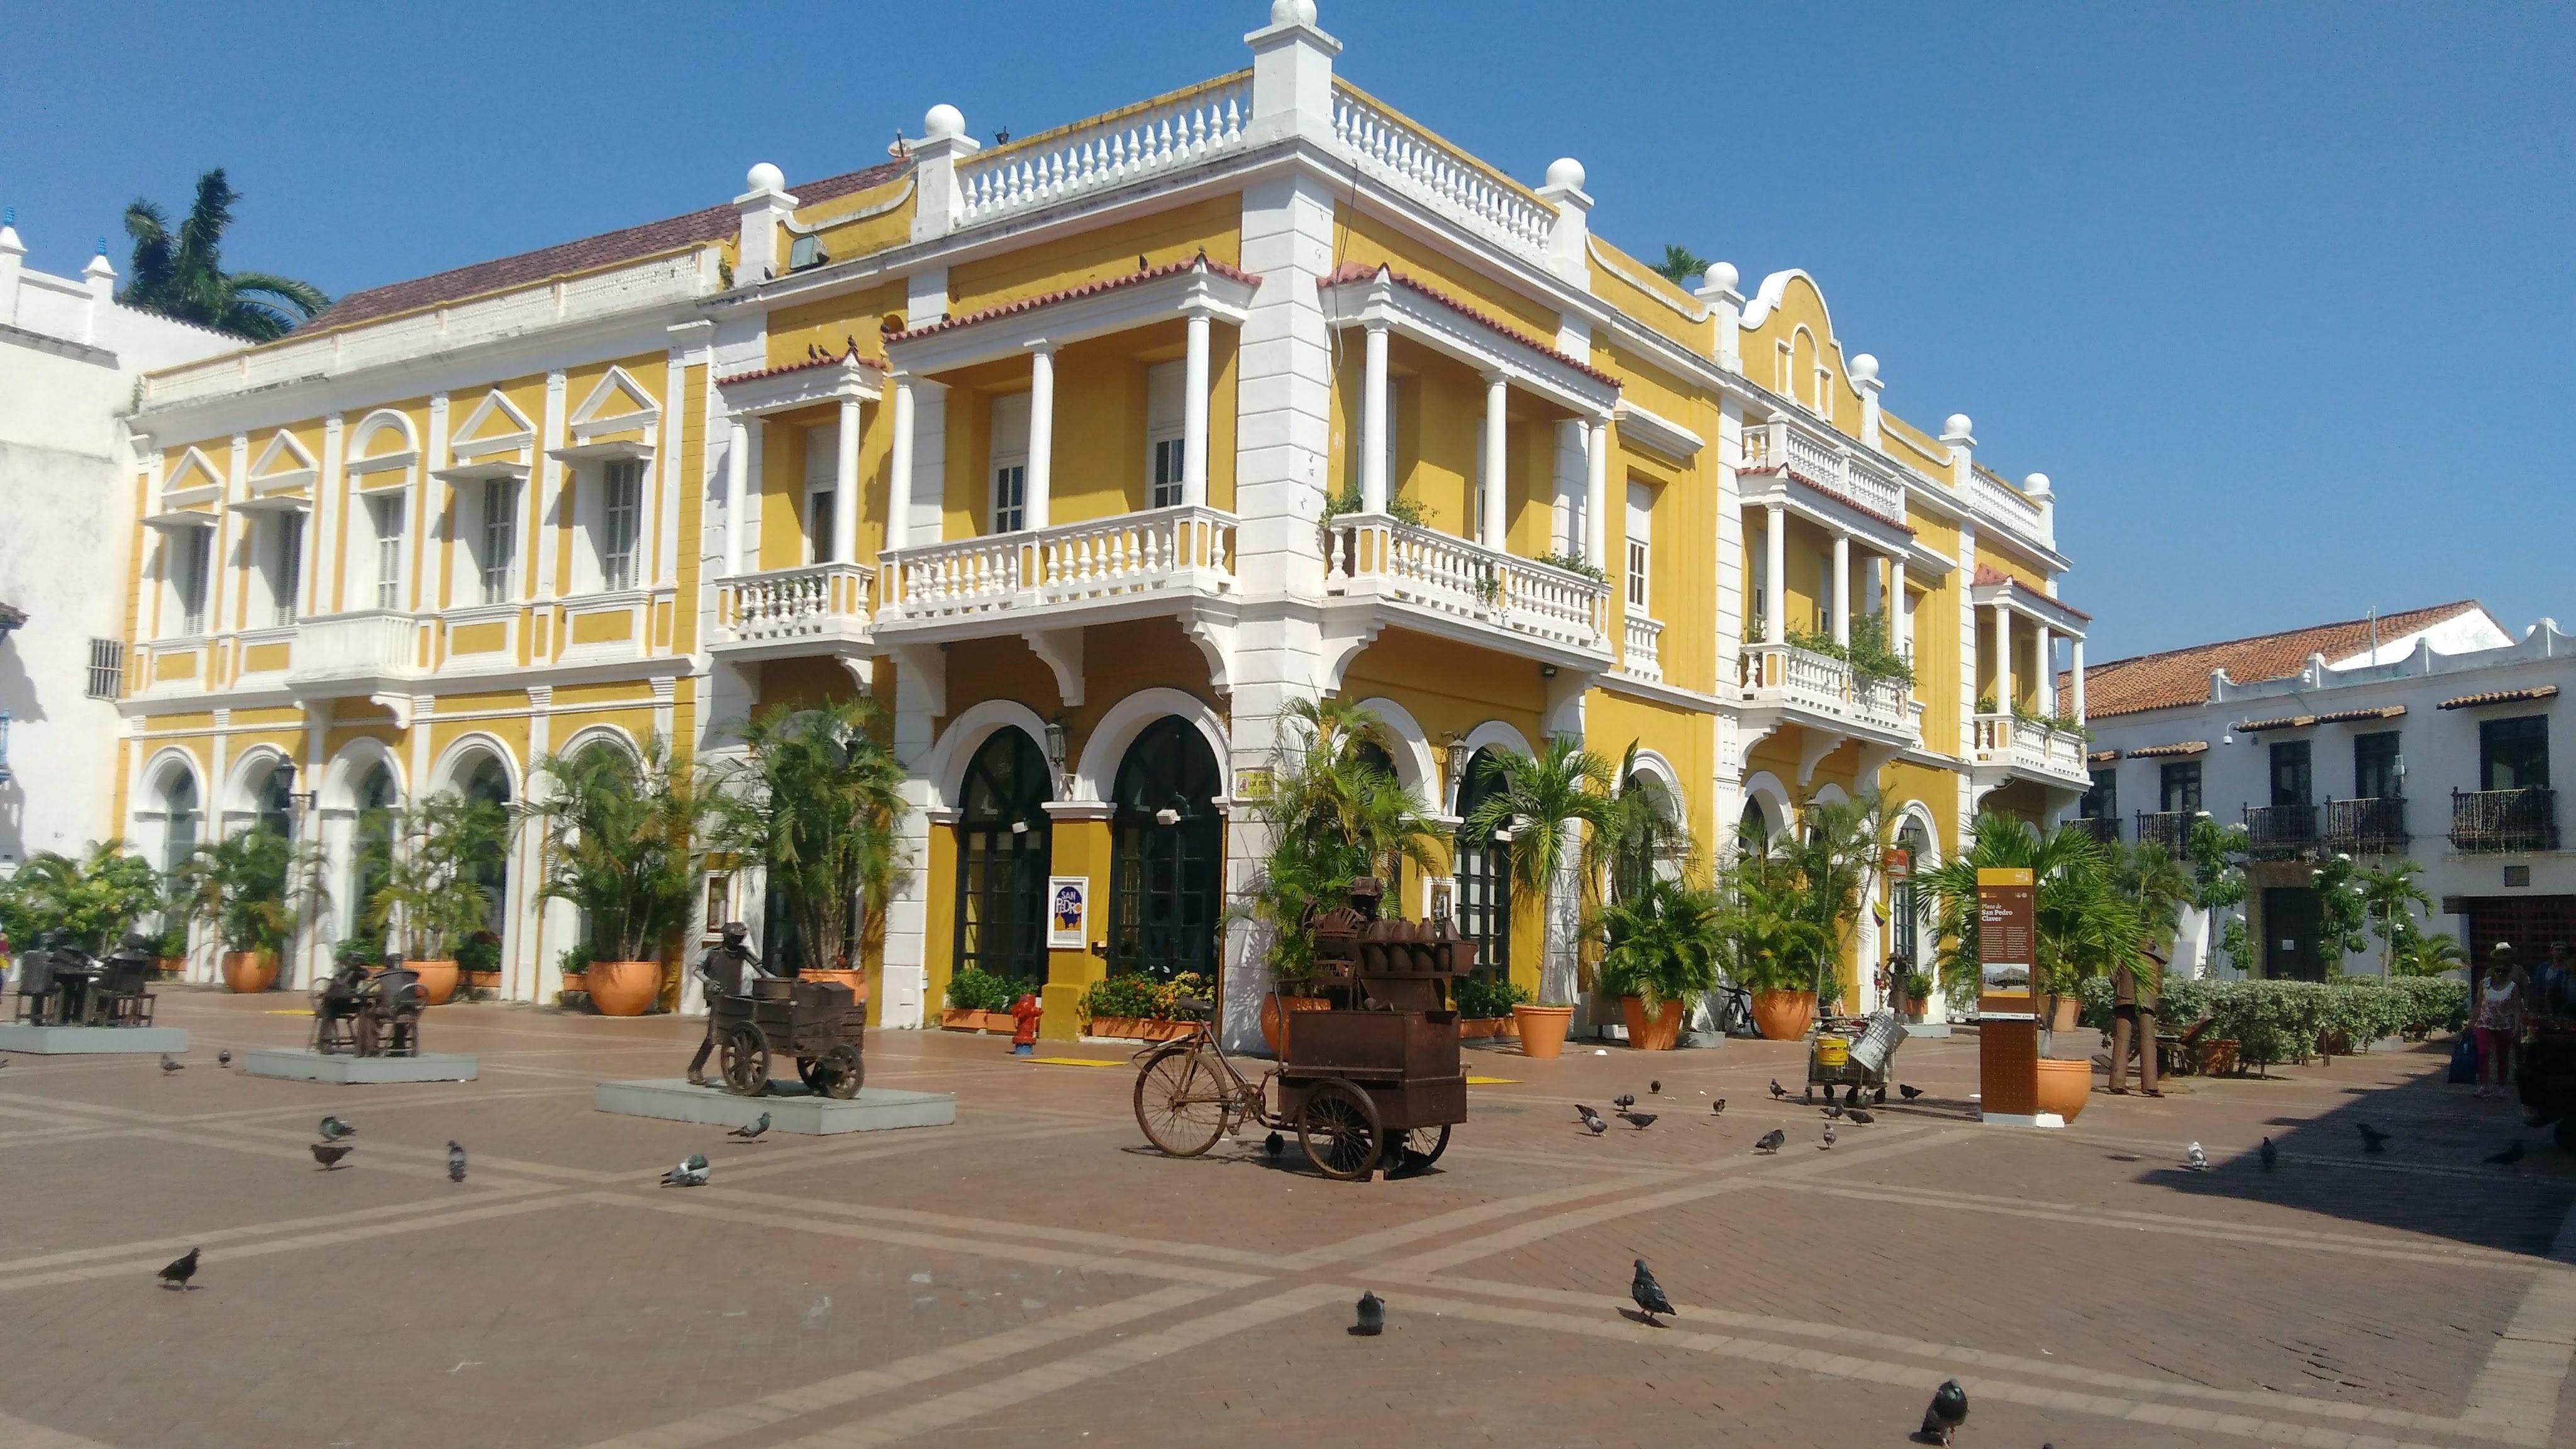 Fotos gratis arquitectura calle edificio palacio - Arquitectura cartagena ...